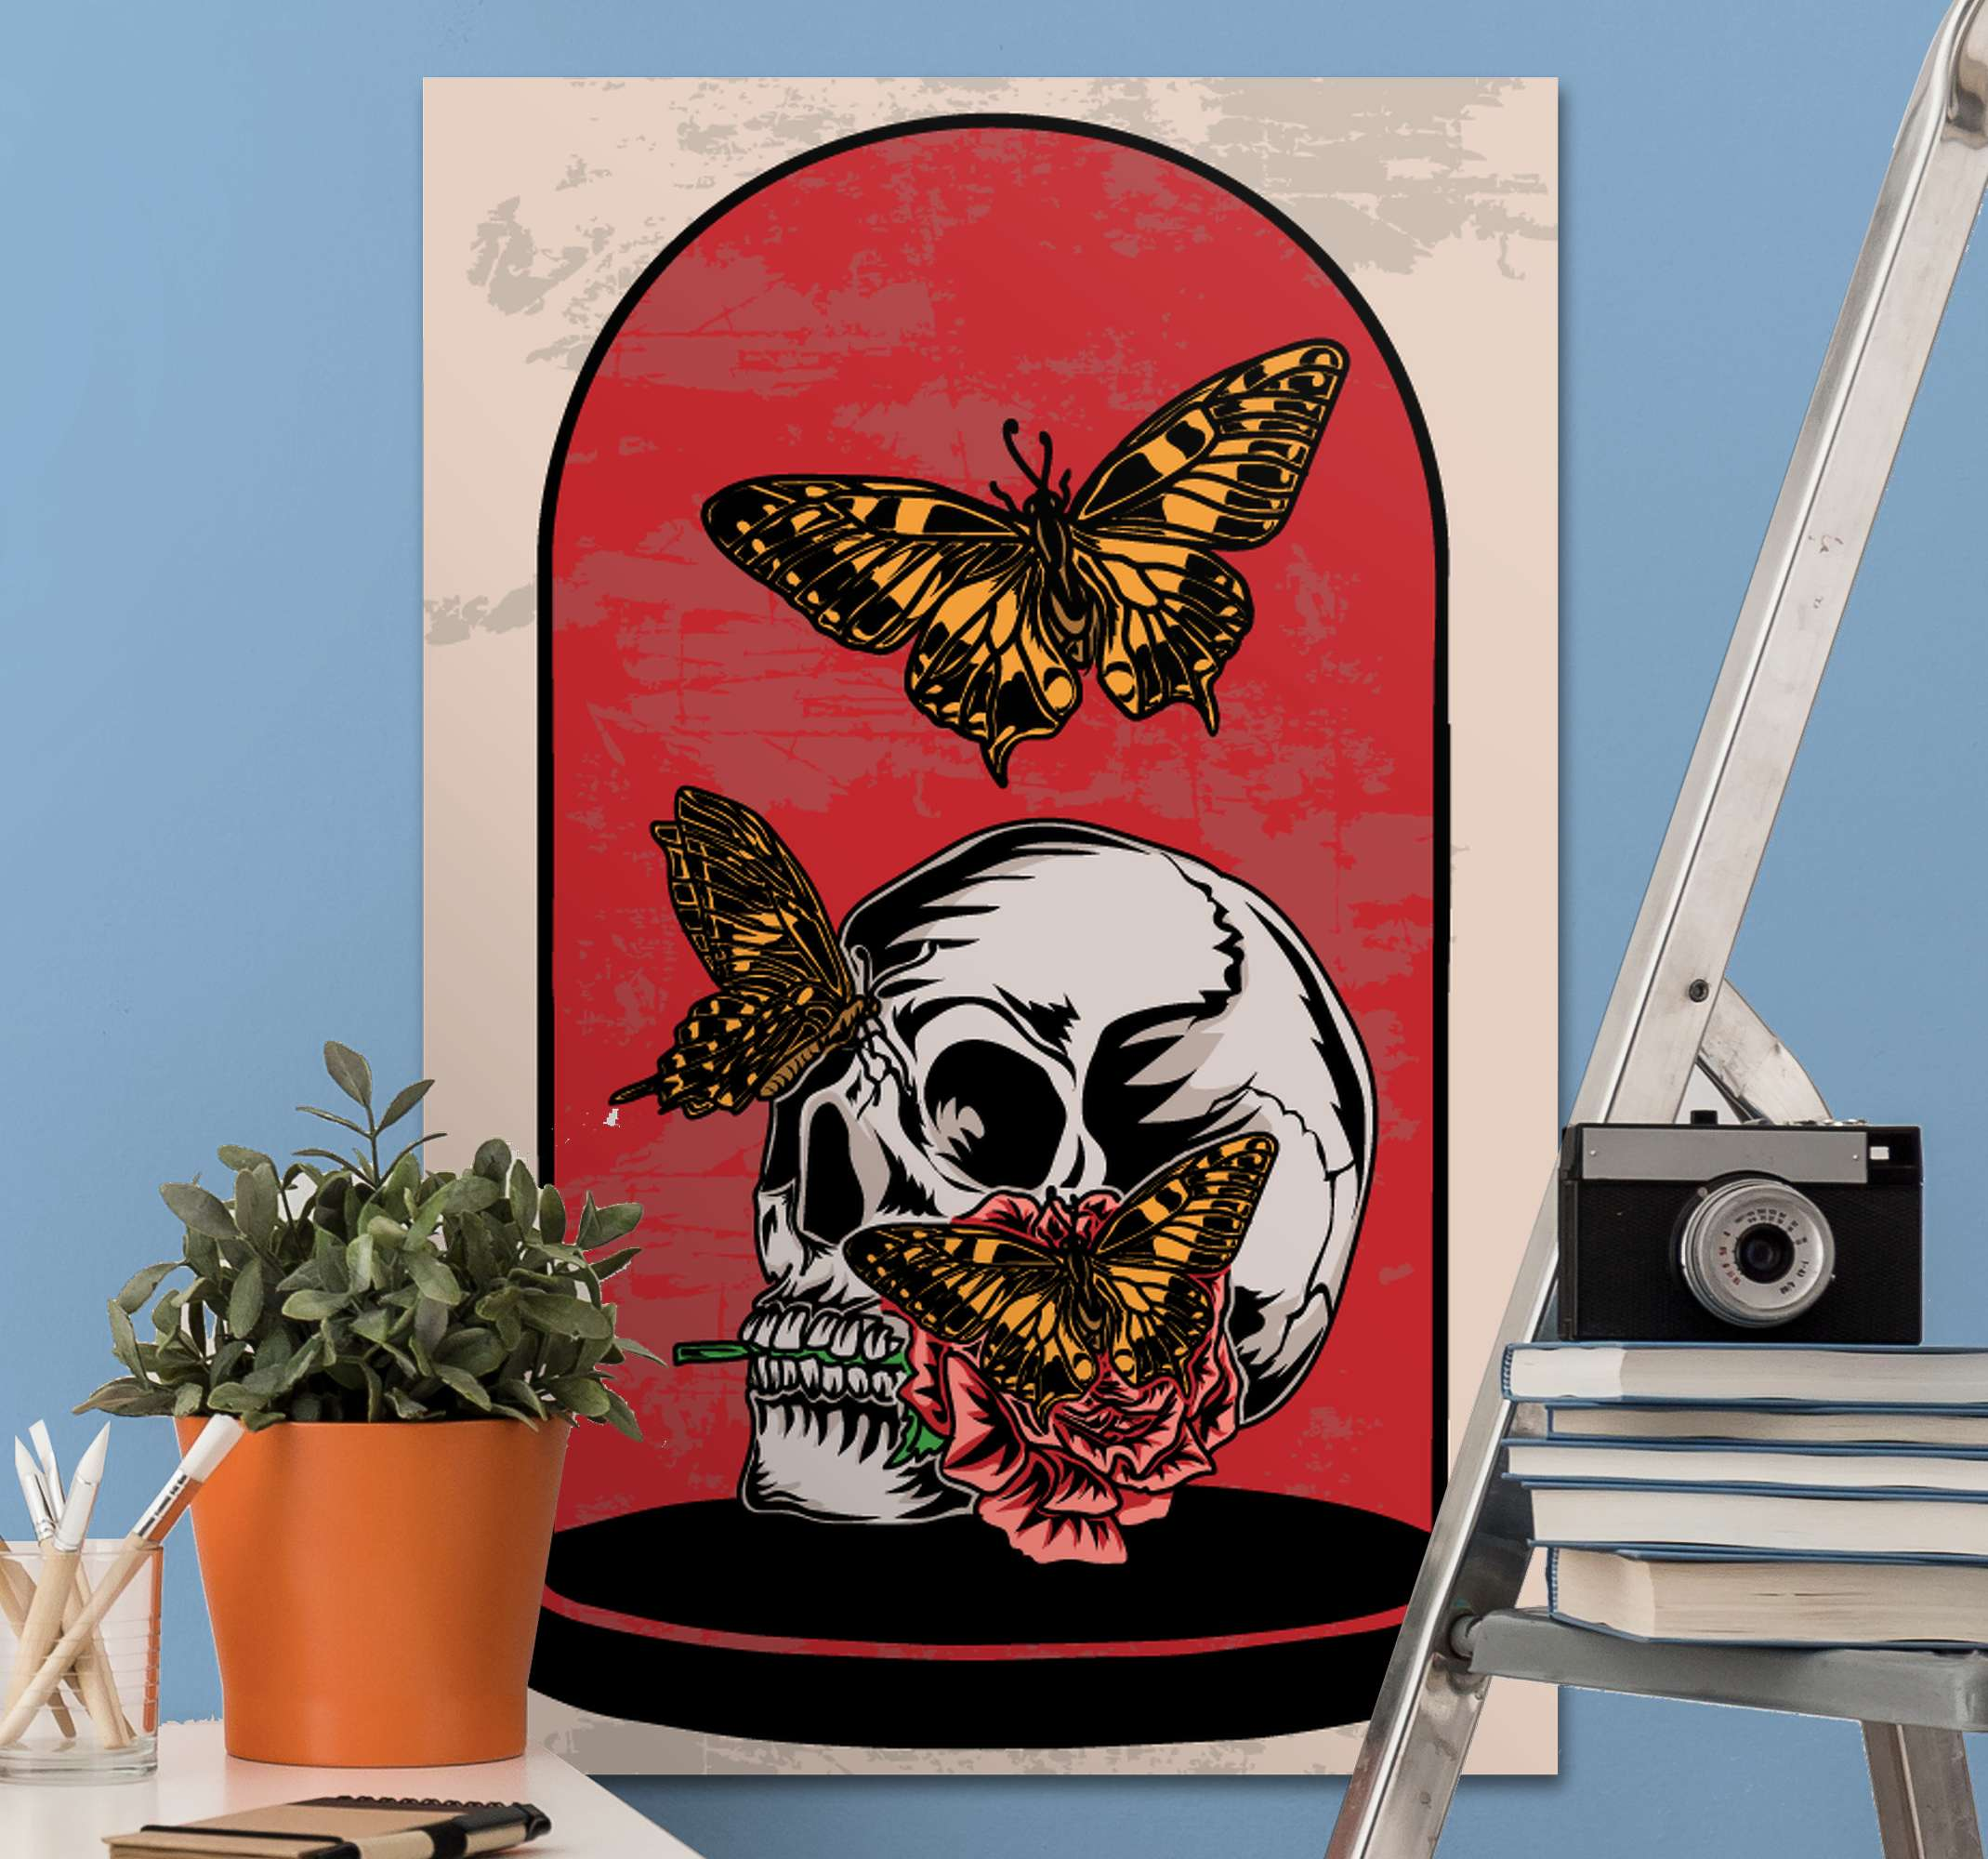 TenStickers. 时光飞逝蝴蝶蝴蝶帆布图片. 蝴蝶壁画,上面有蝴蝶的插图,周围是骷髅头,粉红色的背景是理想的选择,您可以将它放在房间的墙壁上。